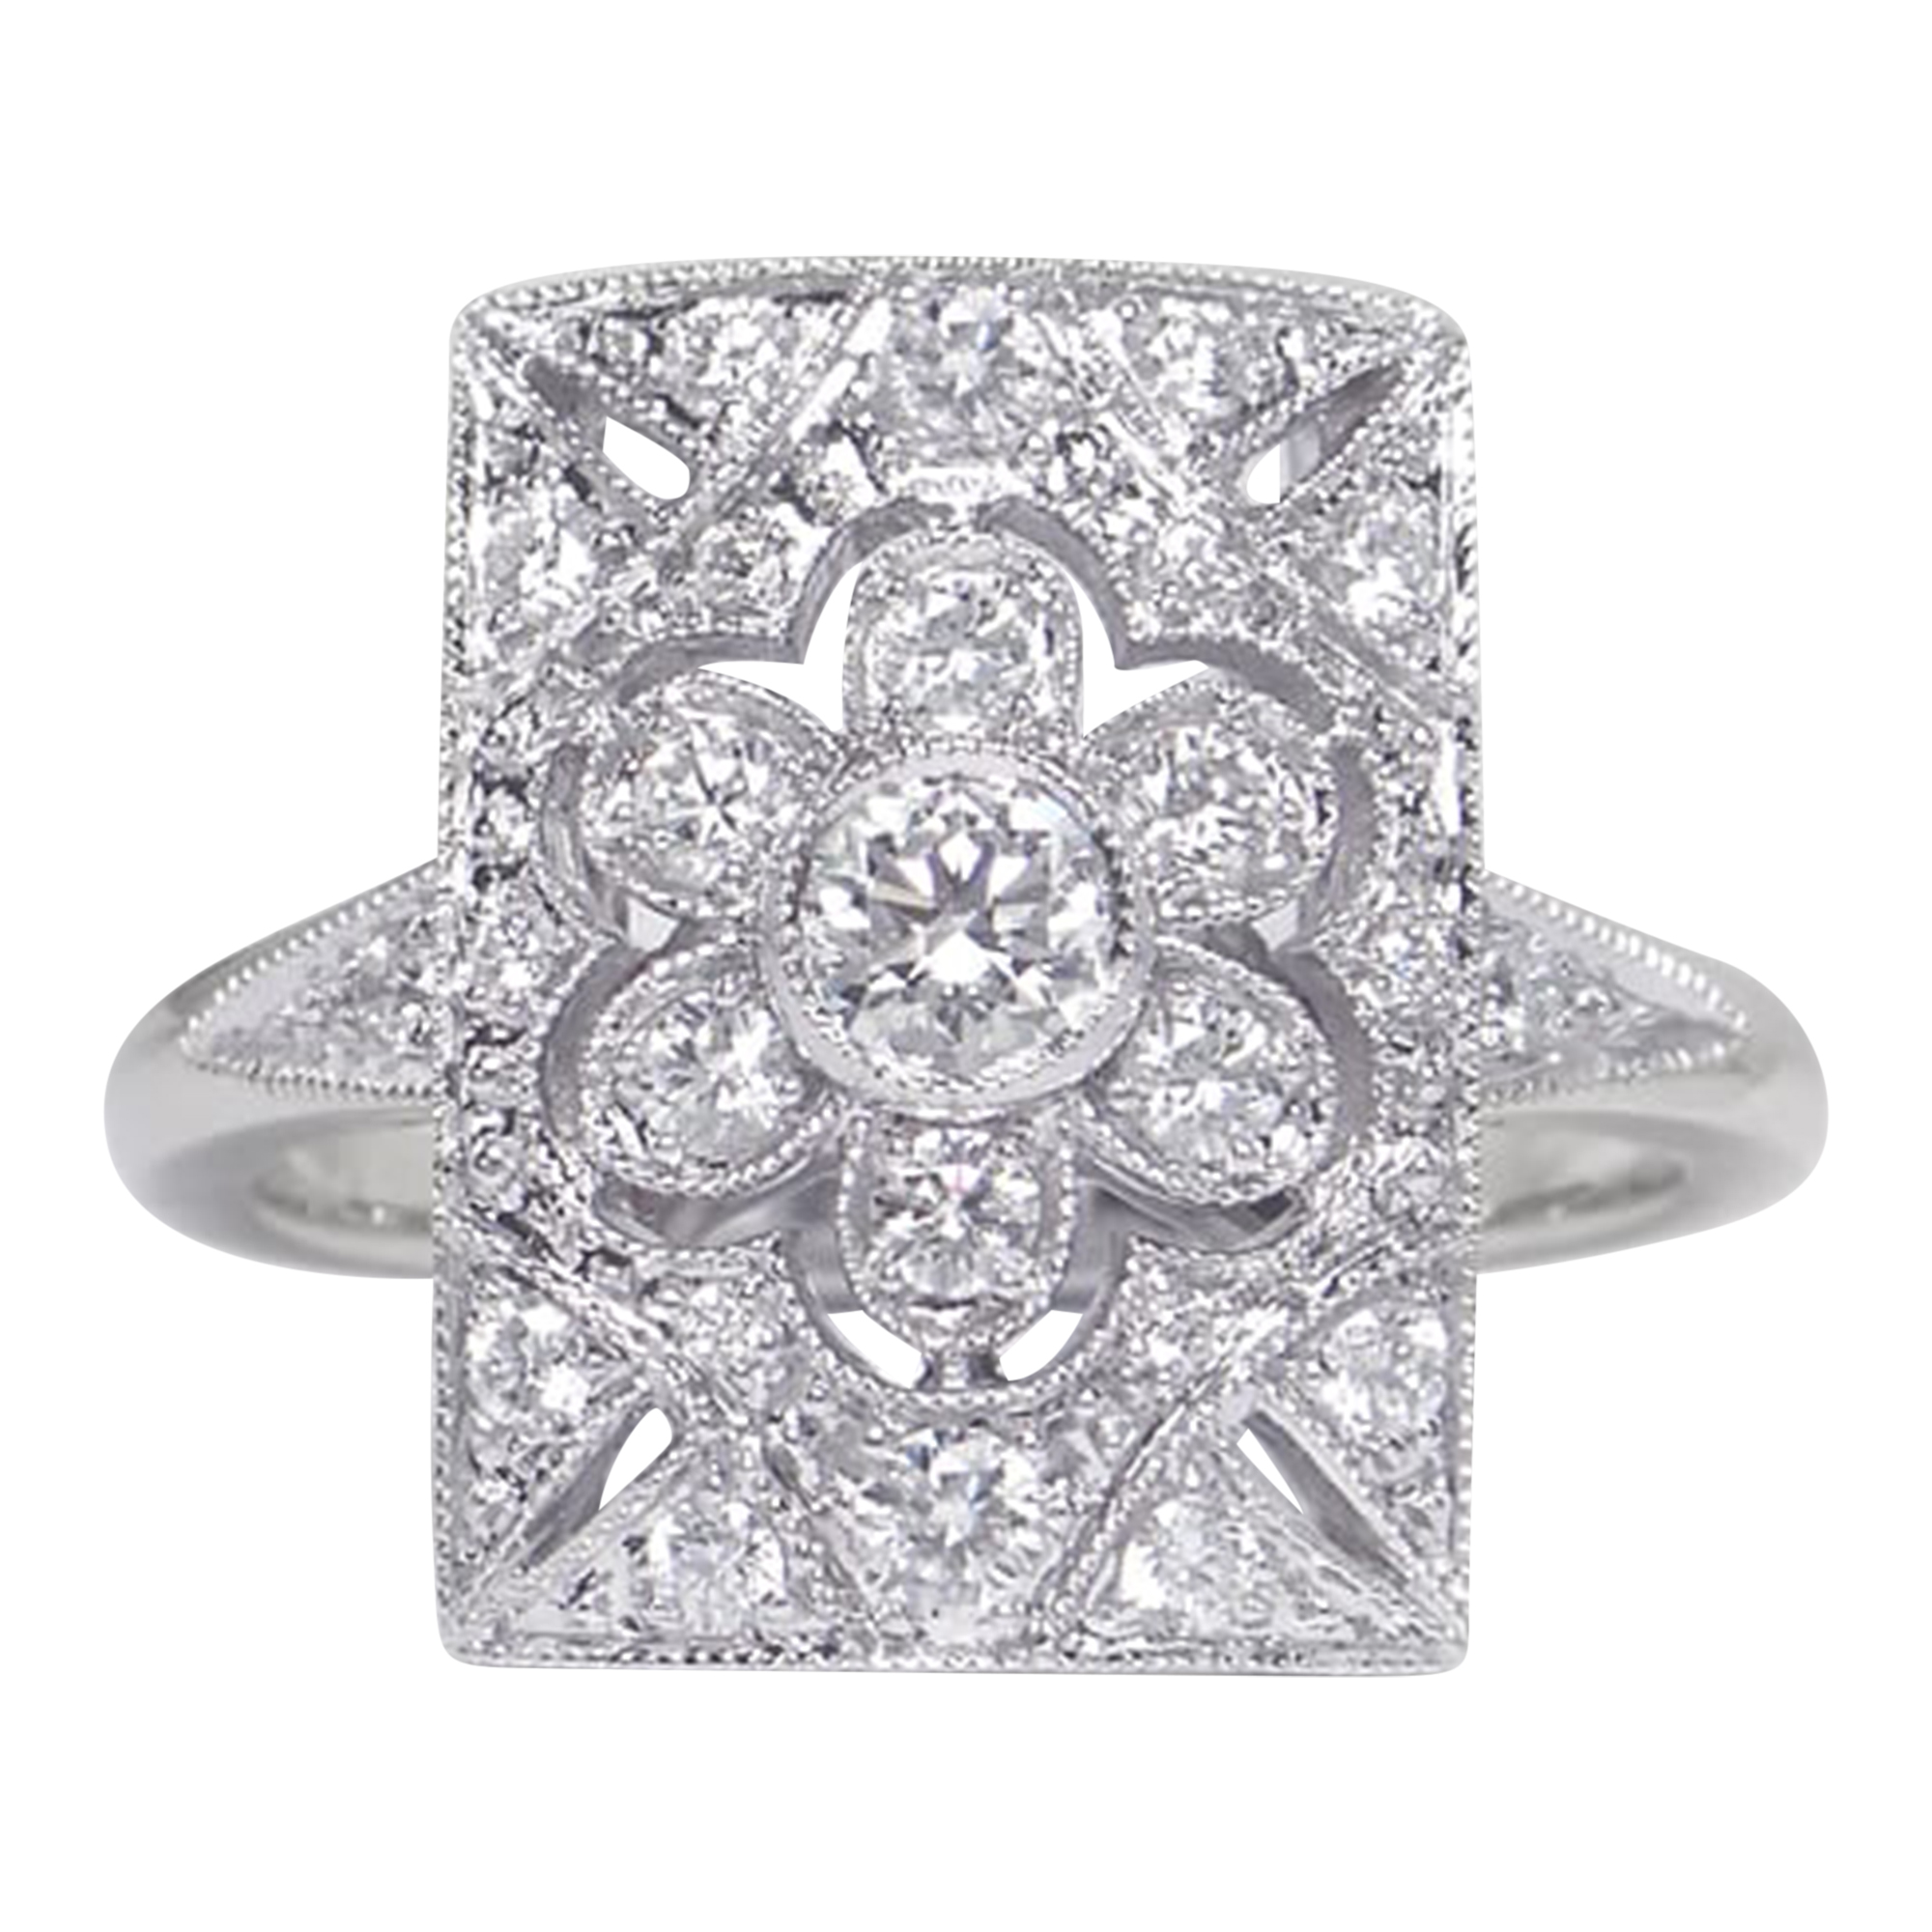 18ct White Gold Diamond Art Deco Ring